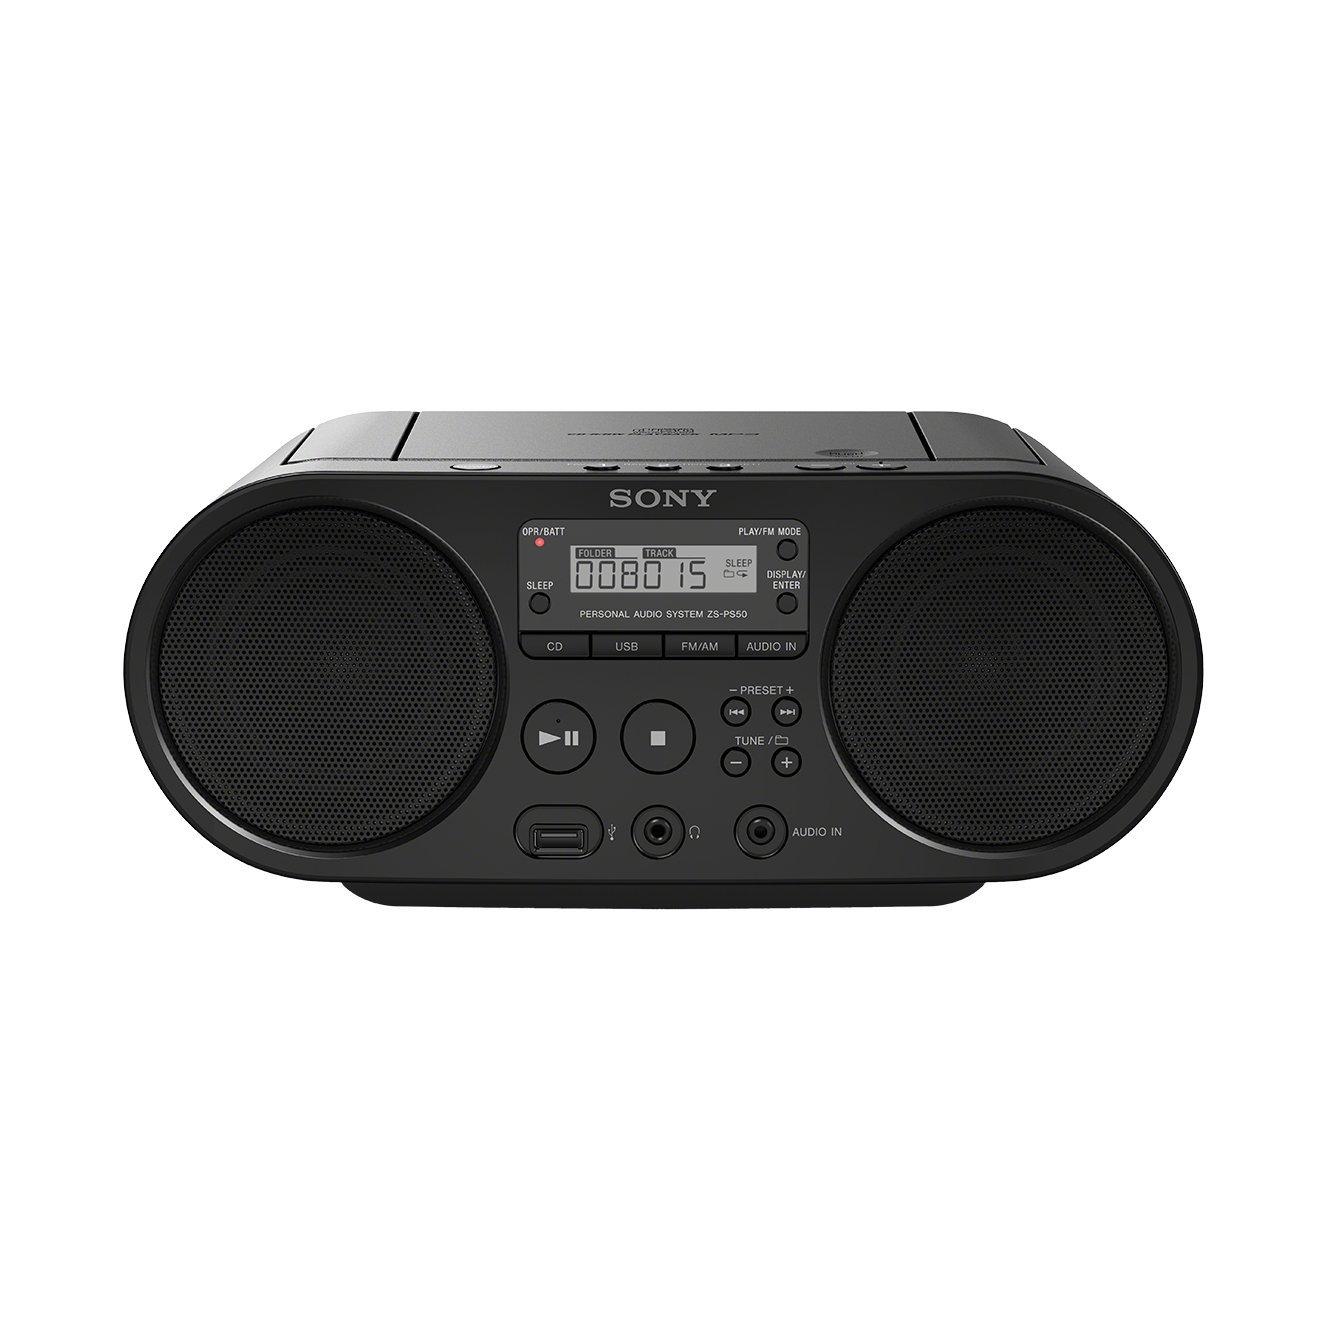 Sony CD Boombox with AM/FM Radio USB Playback/Audio Input, ZSPS50B.CED (USB Playback/Audio Input)